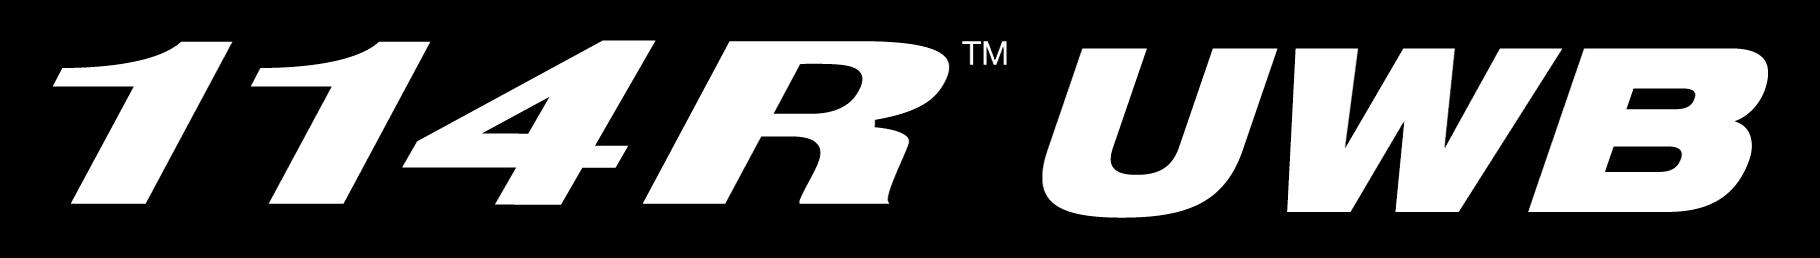 114R UWB Banner Logo